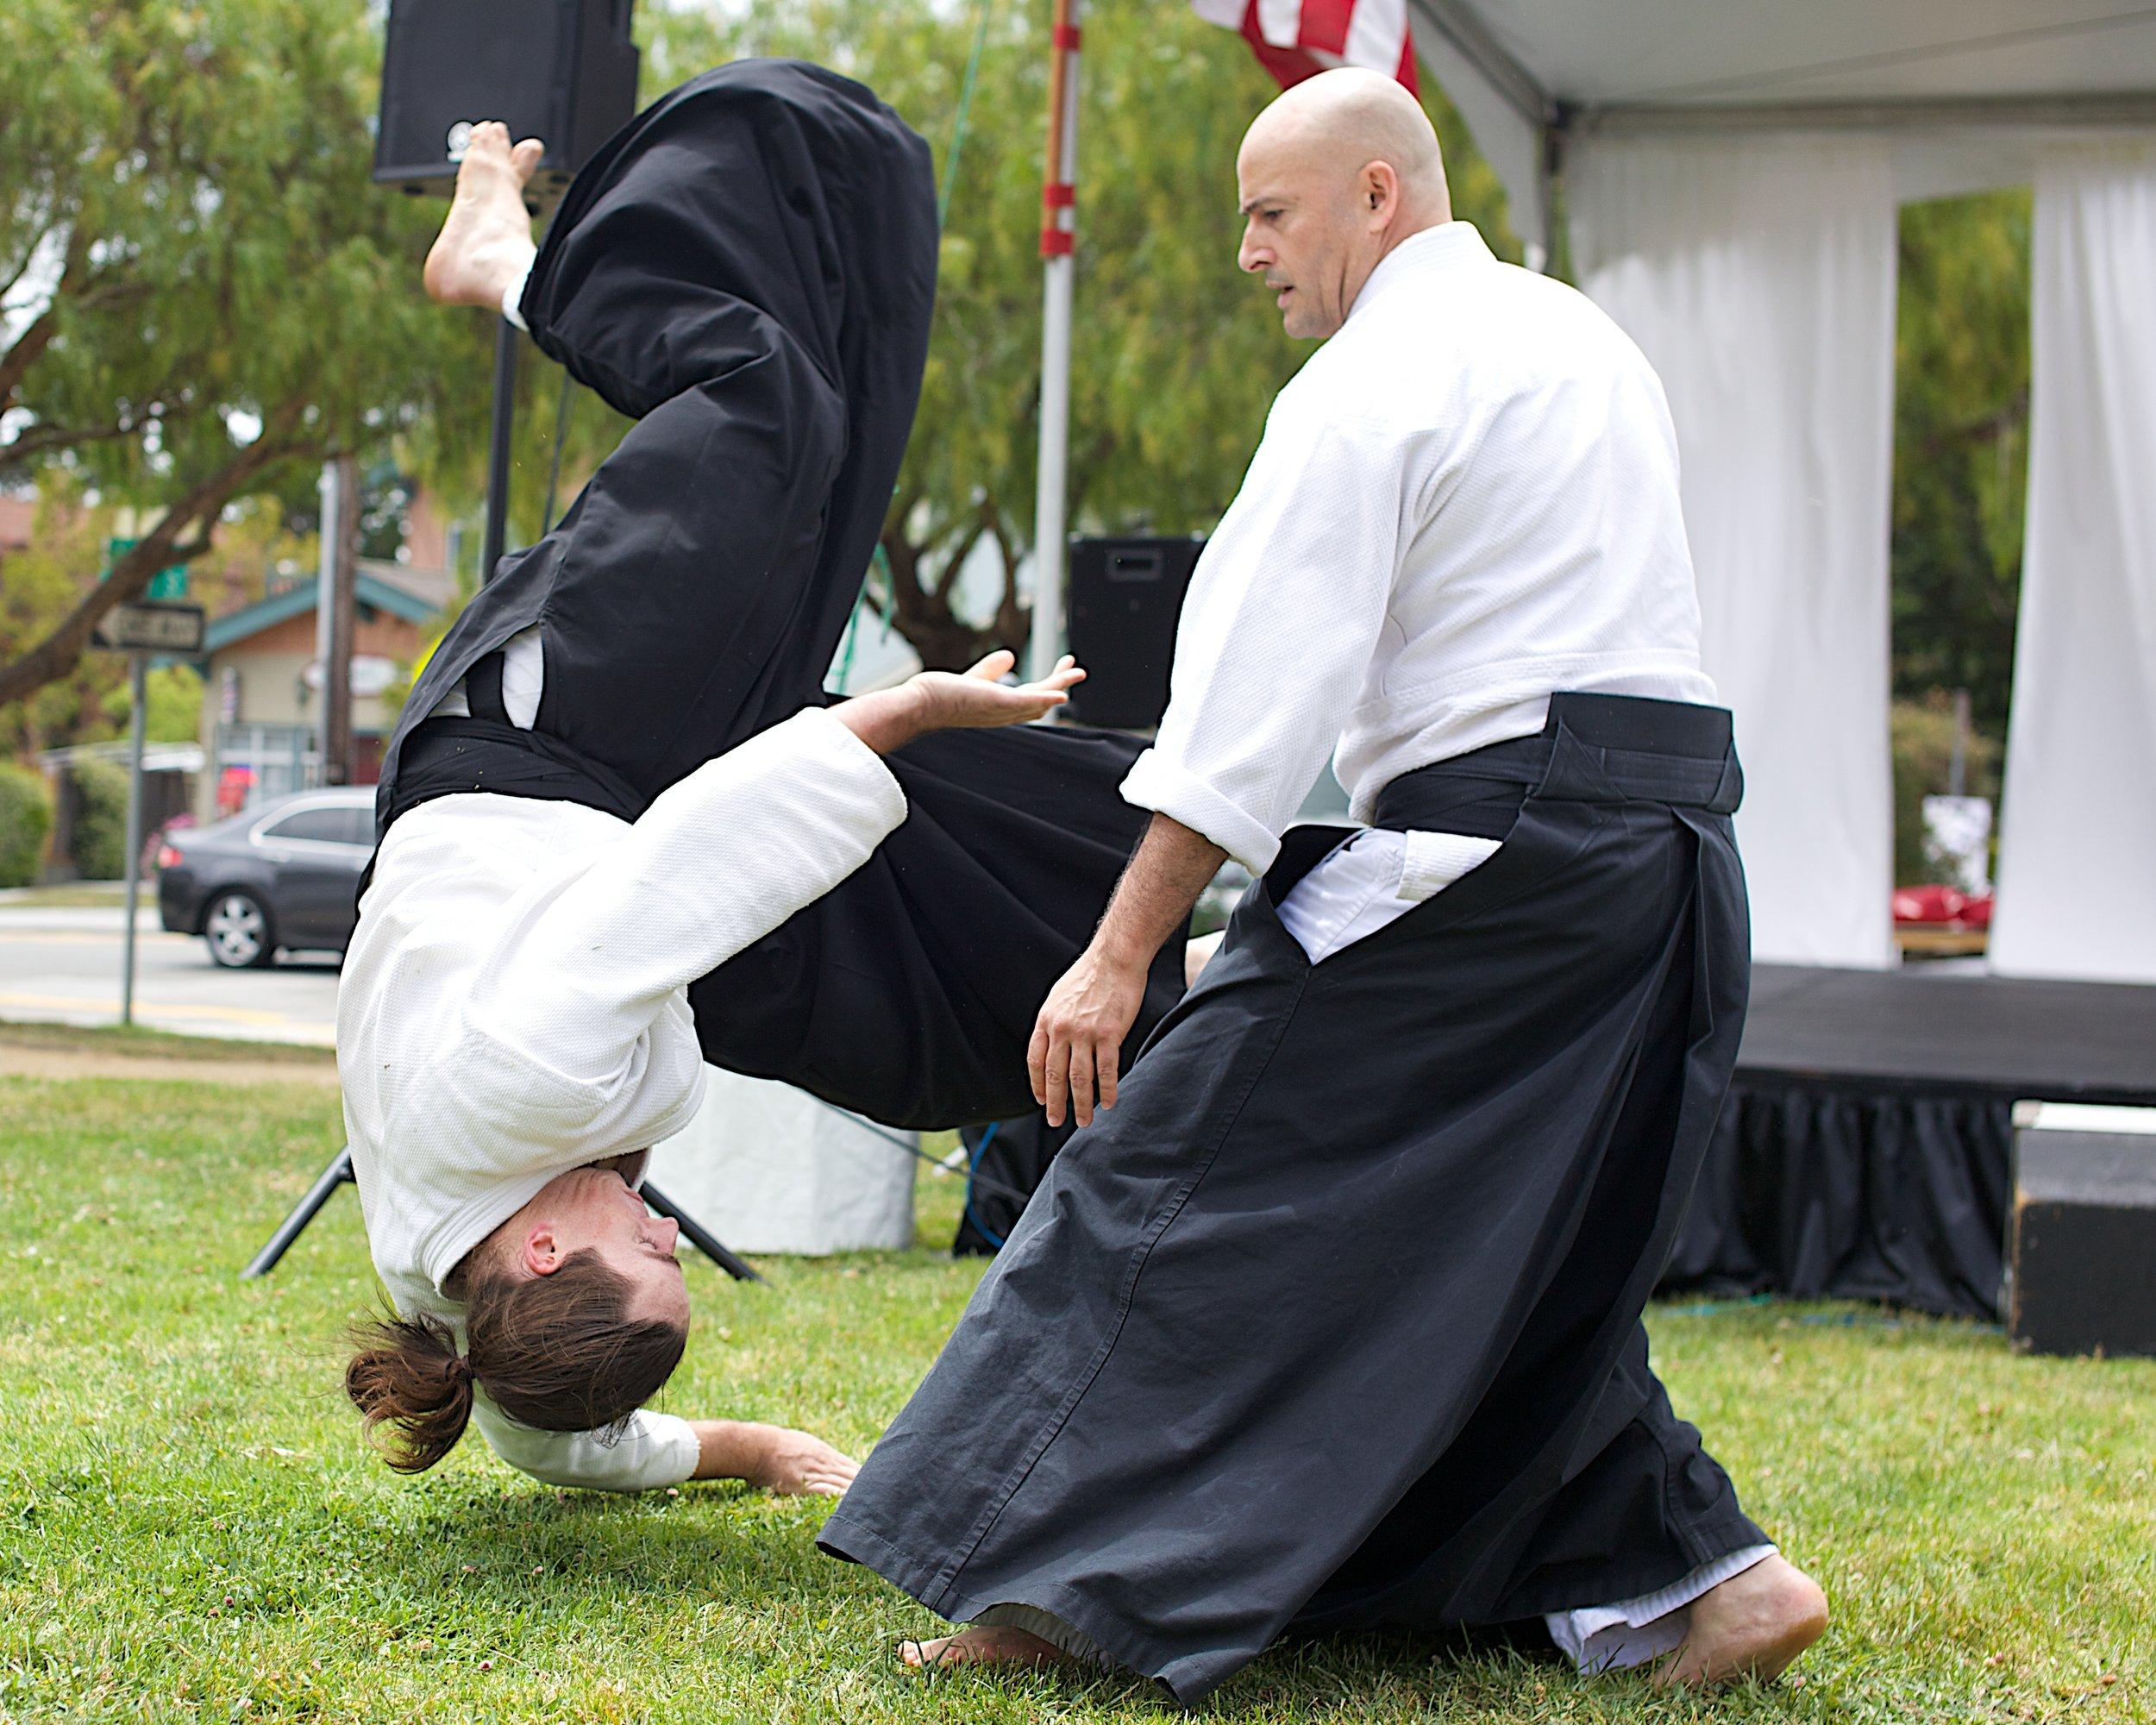 aikido-of-santa-cruz---japanese-cultural-fair-of-santa-cruz-2015_18975796183_o.jpg